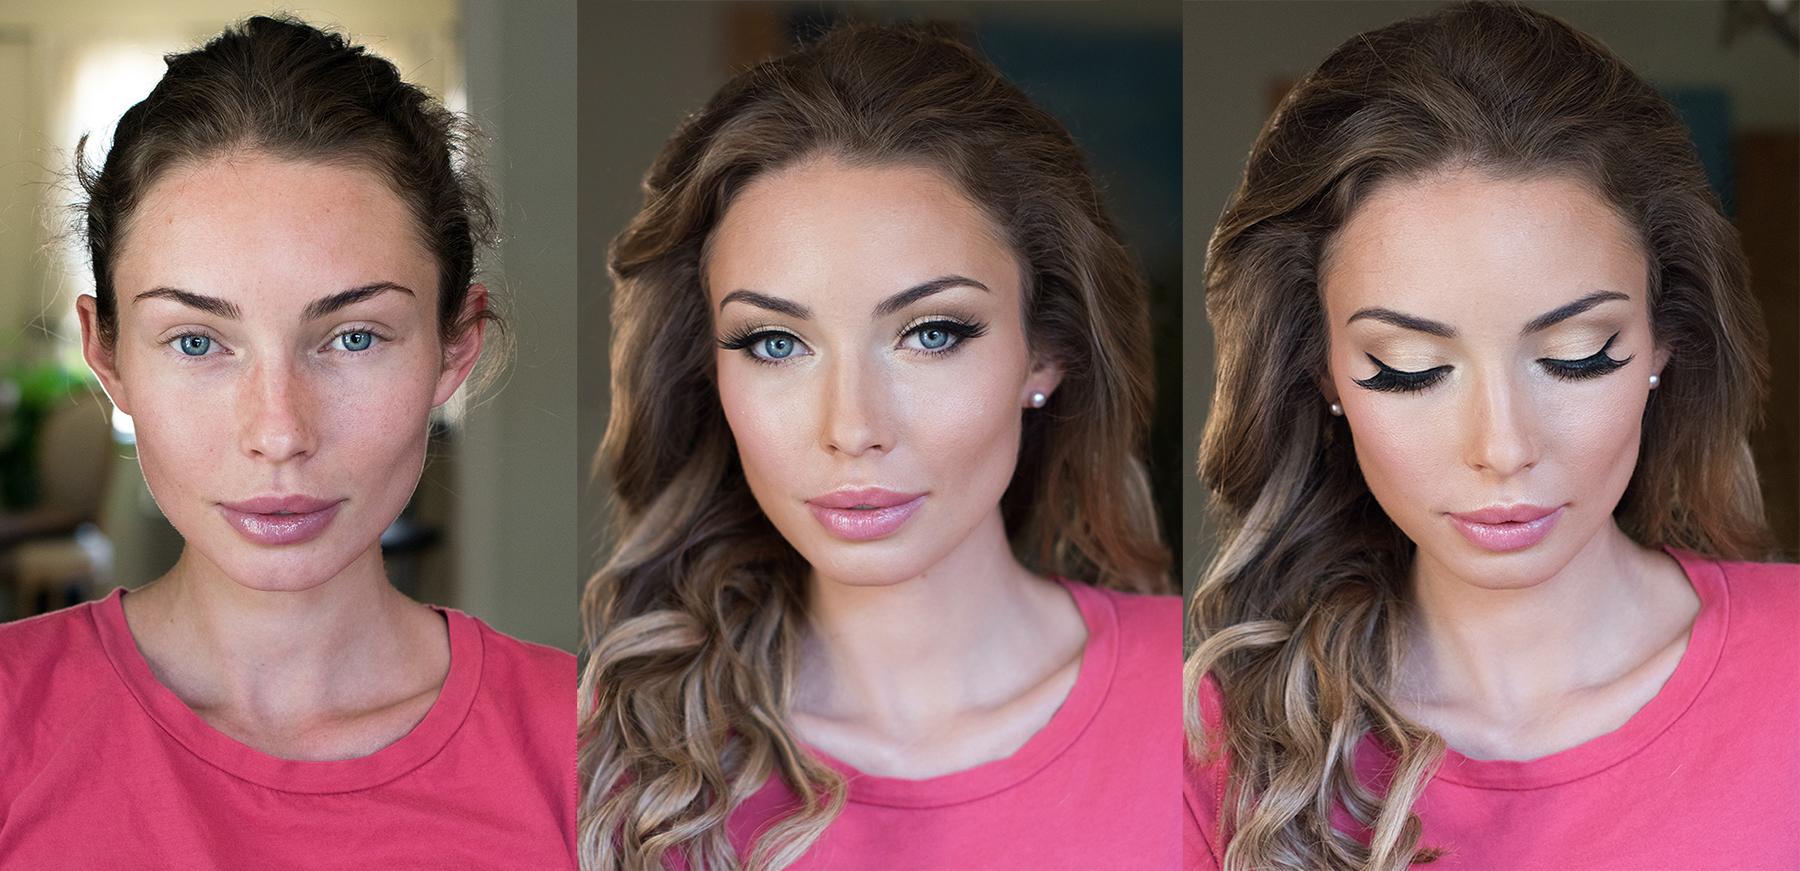 blue eyes blonde makeup eyeliner pink lips natural glam Before and after beauty affair.jpg